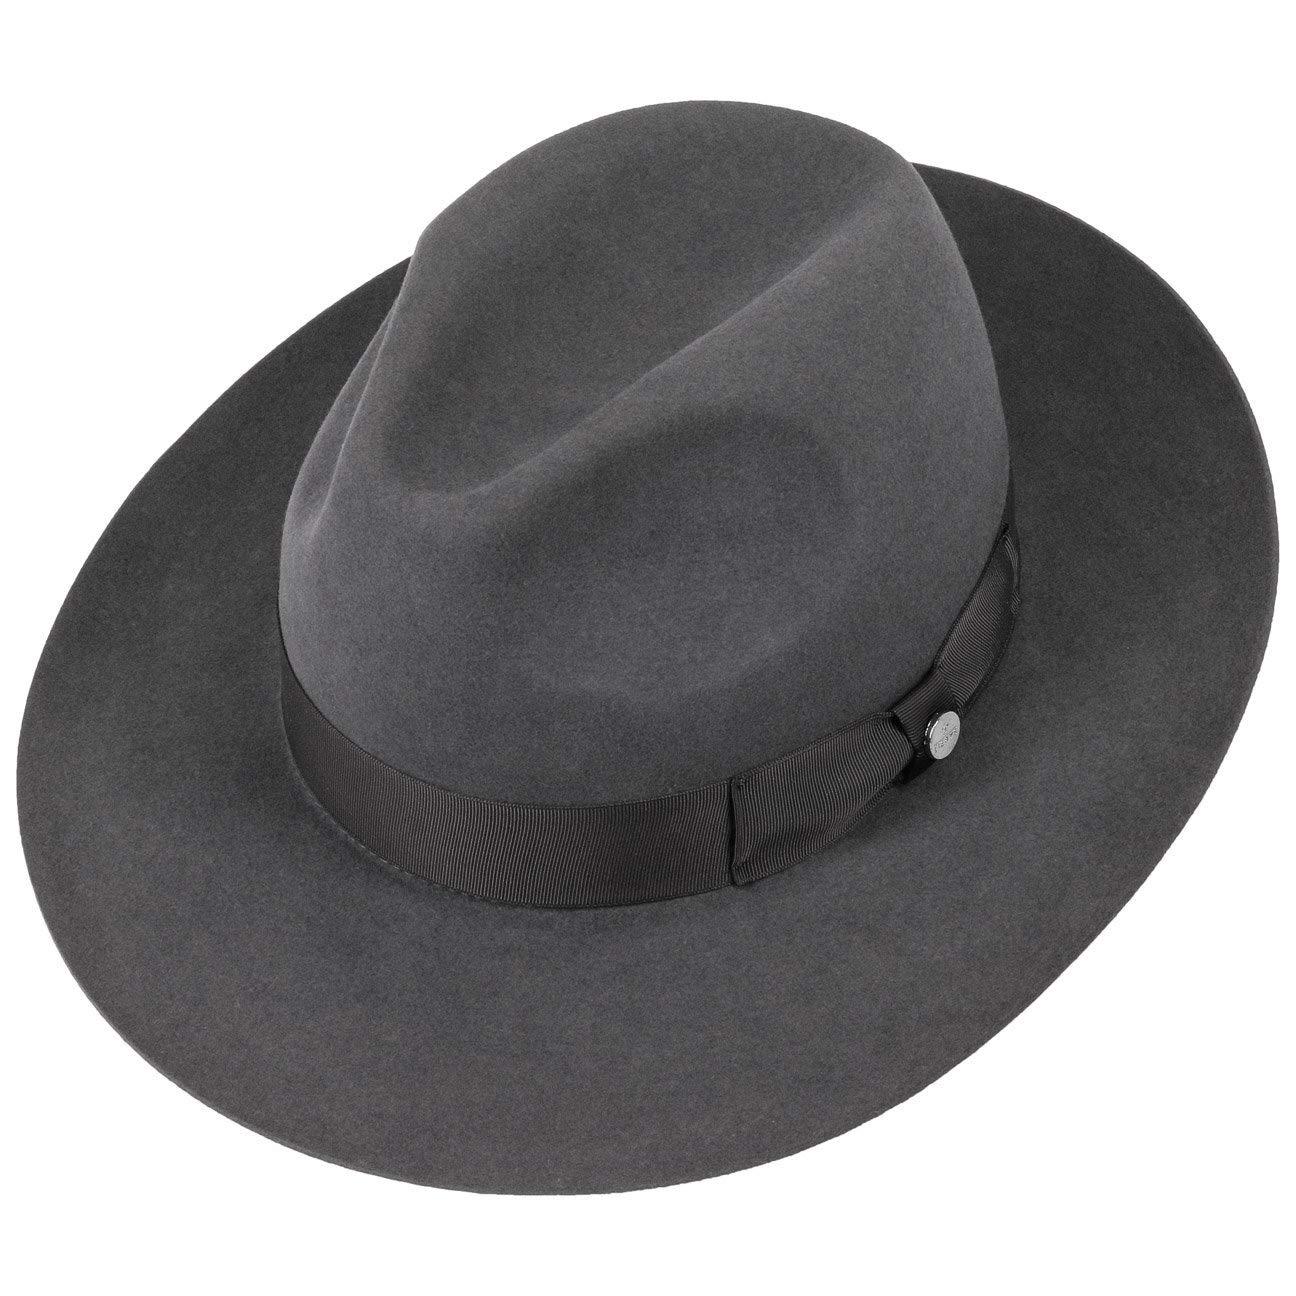 226bb65c481cd Sombrero Bogart sombrero de fieltrosombreros bogart regalo de Navidad